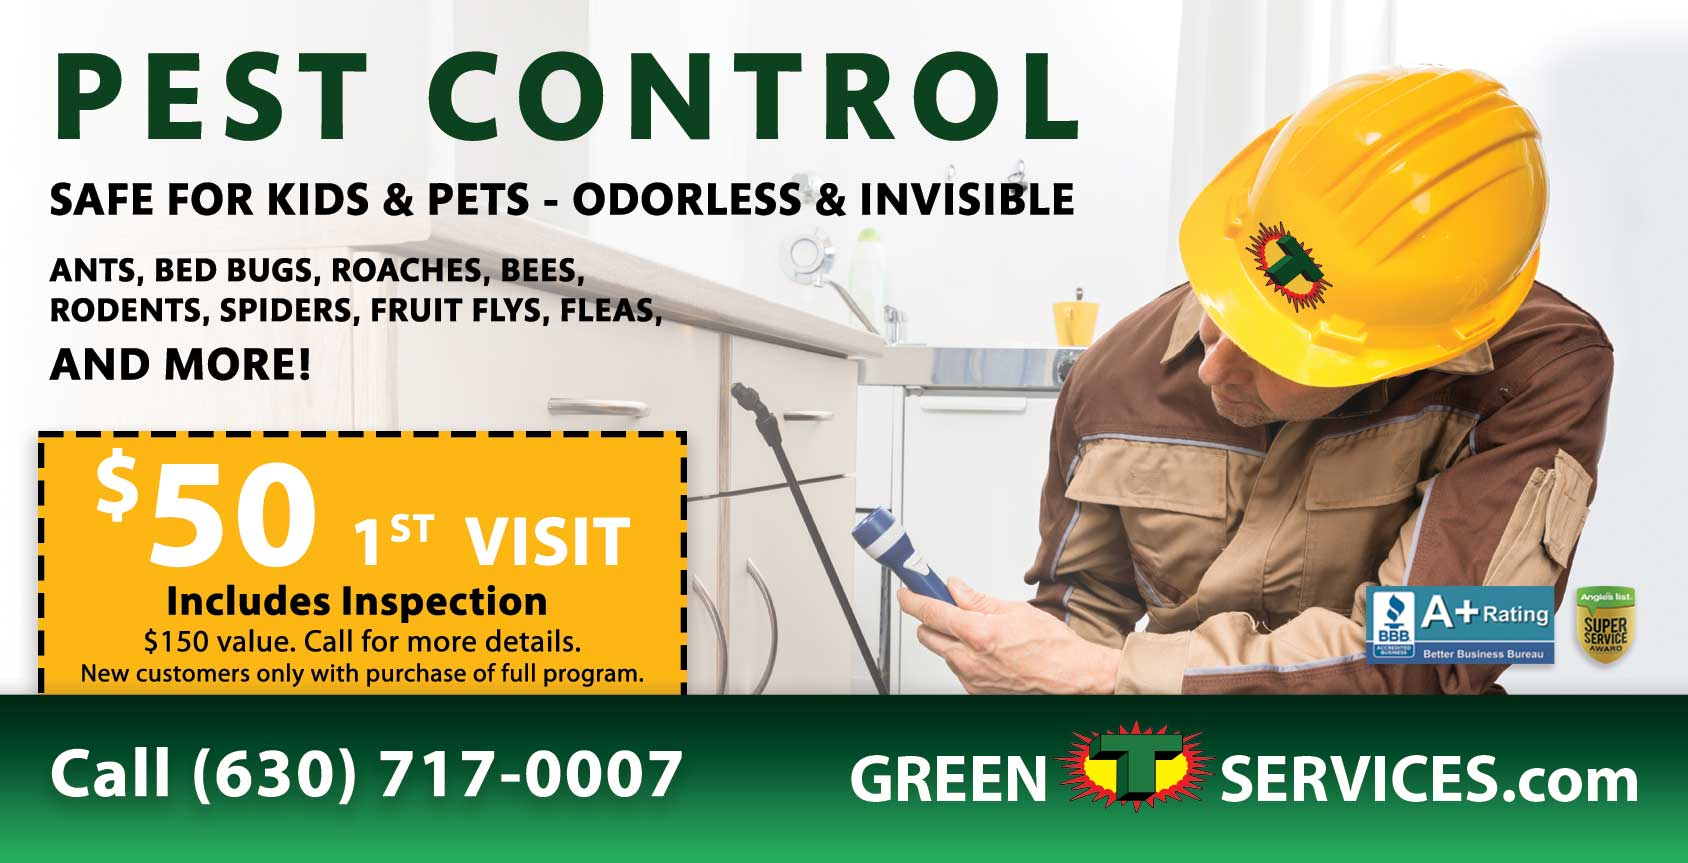 Pest Control Special Offer